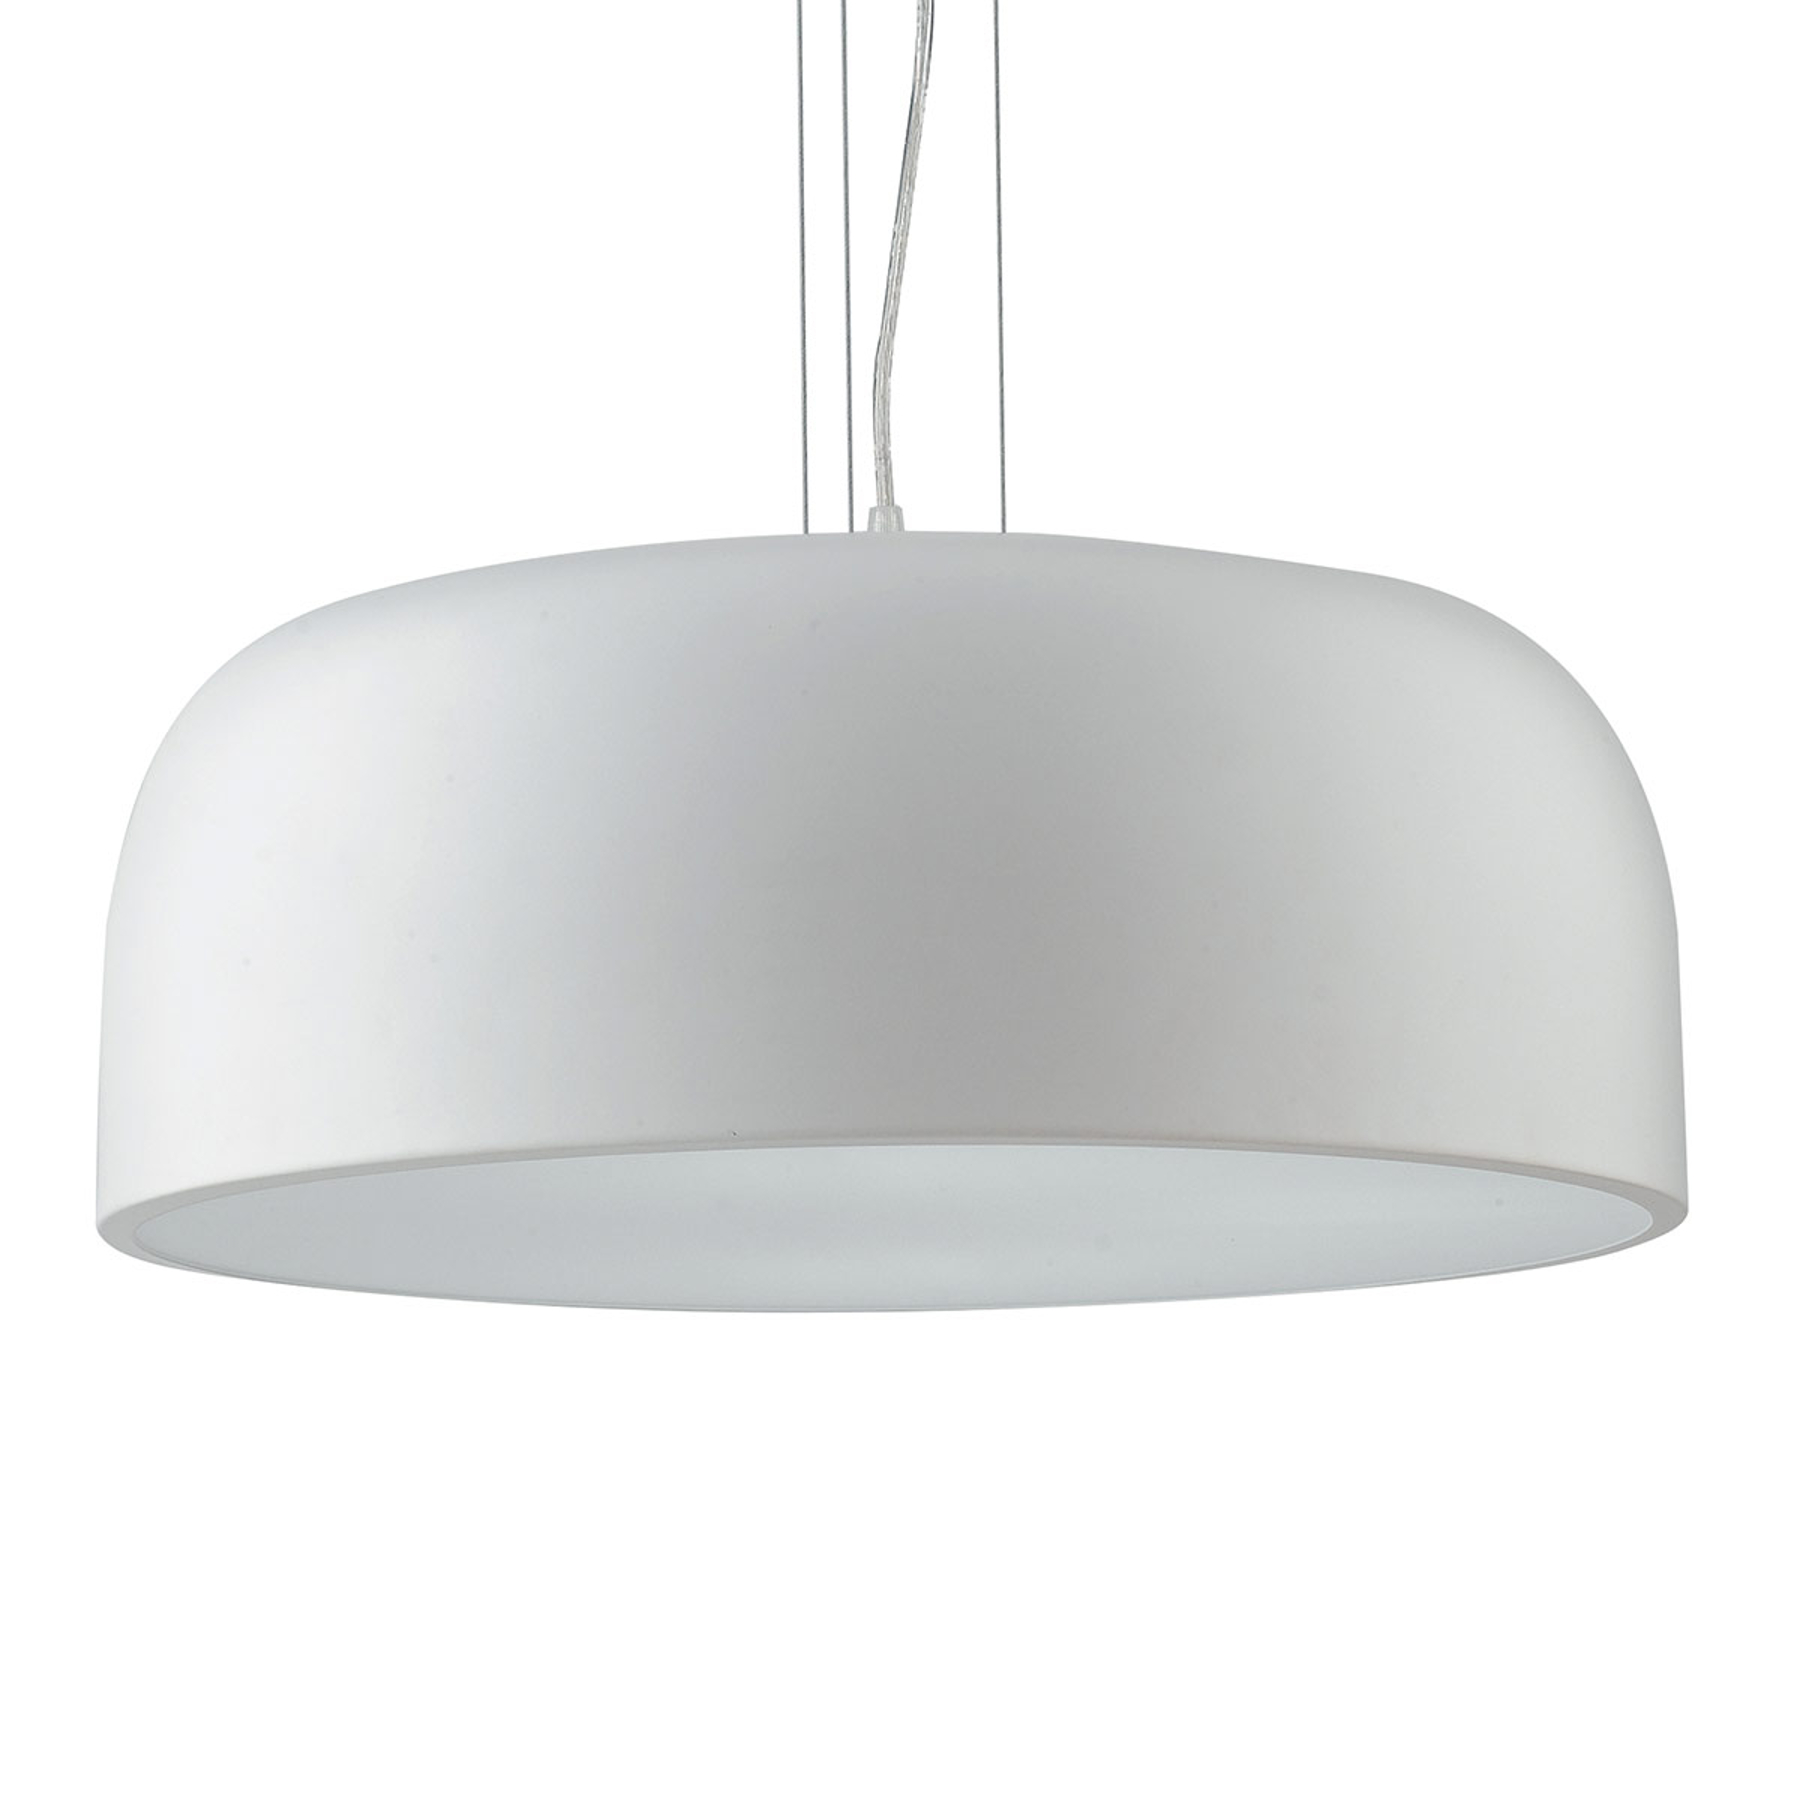 Lampa wisząca Bistrot biała